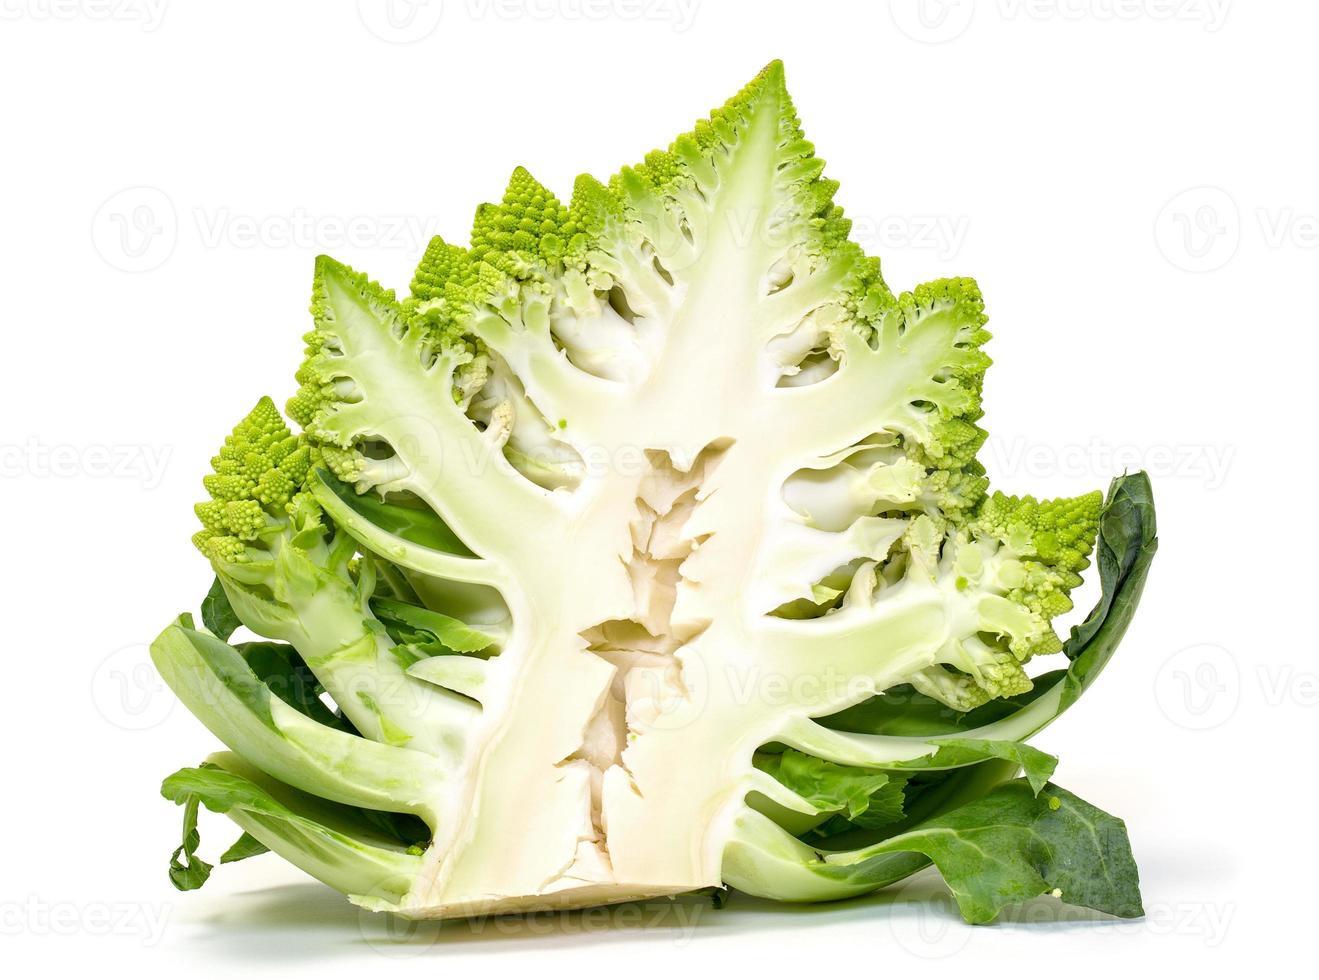 Half Green Fresh Romanesque Cauliflower photo